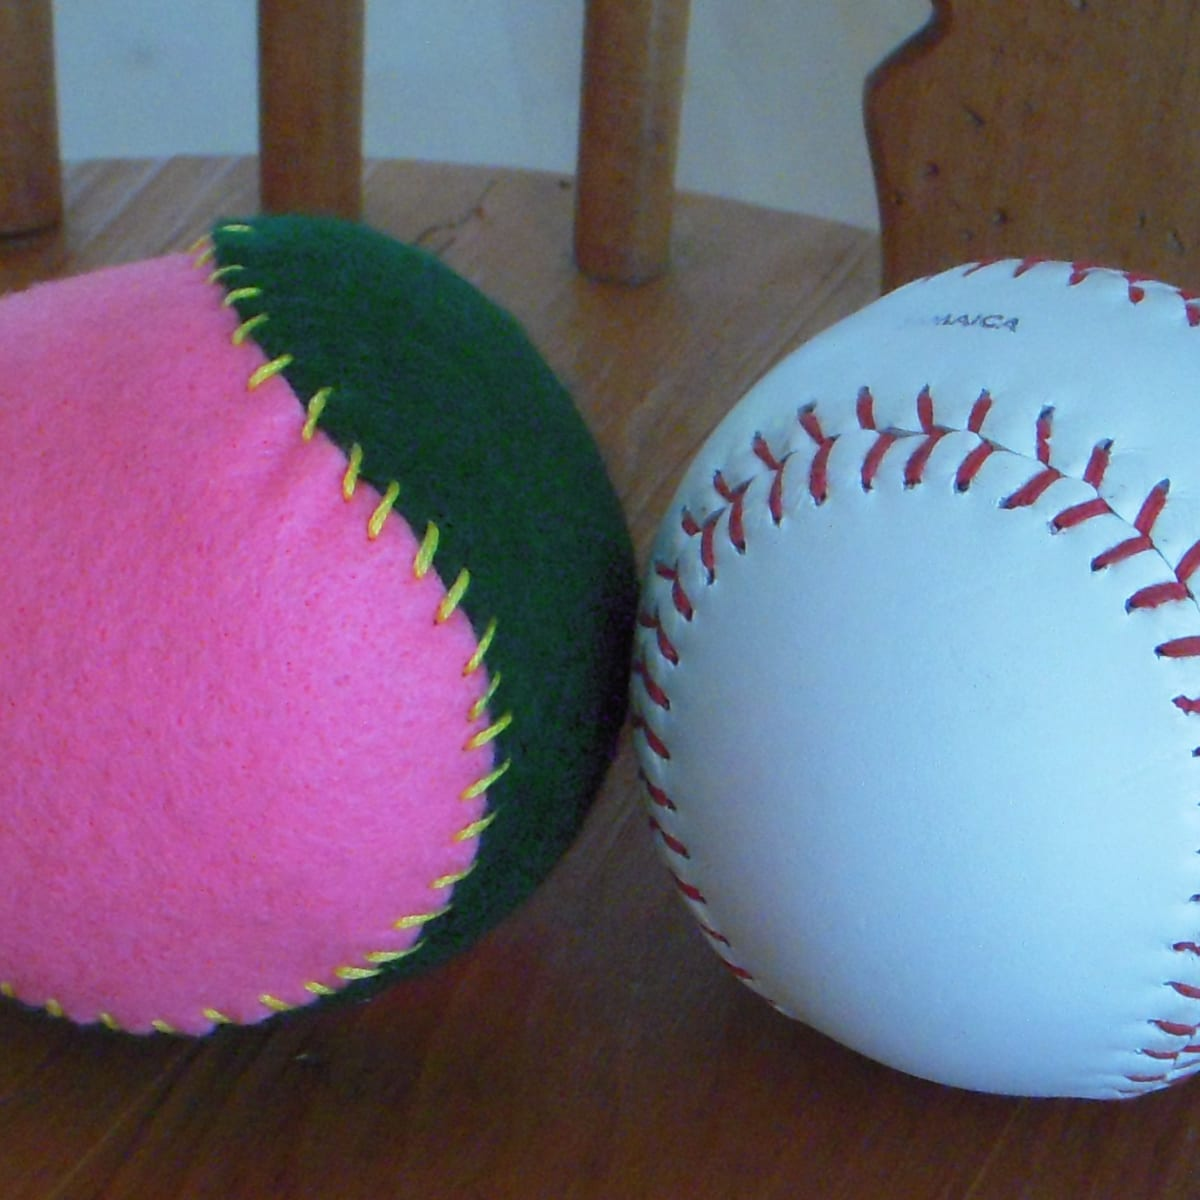 How To Make A Cloth Ball Feltmagnet Crafts